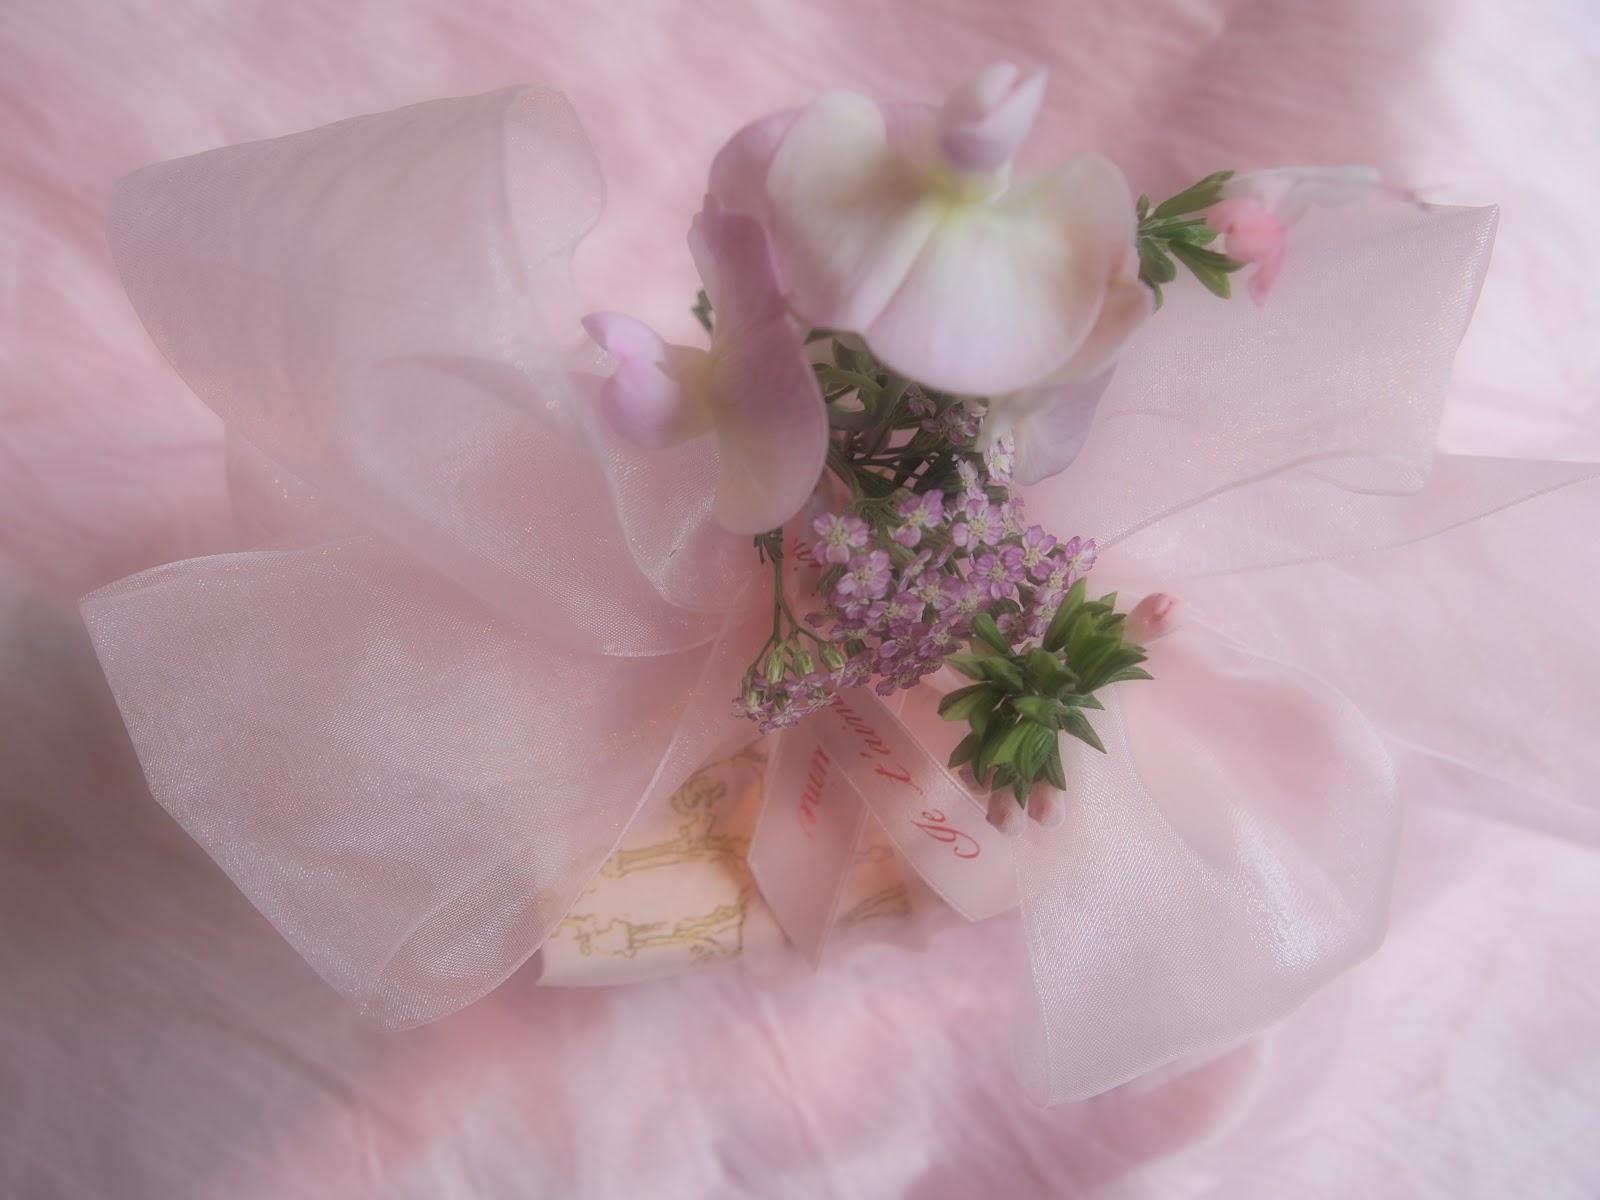 http://3.bp.blogspot.com/-w9rdVgAnmwY/T77ELiEd6kI/AAAAAAAAE9g/VHlawcyM5gE/s1600/gift+wrapping+024.jpg